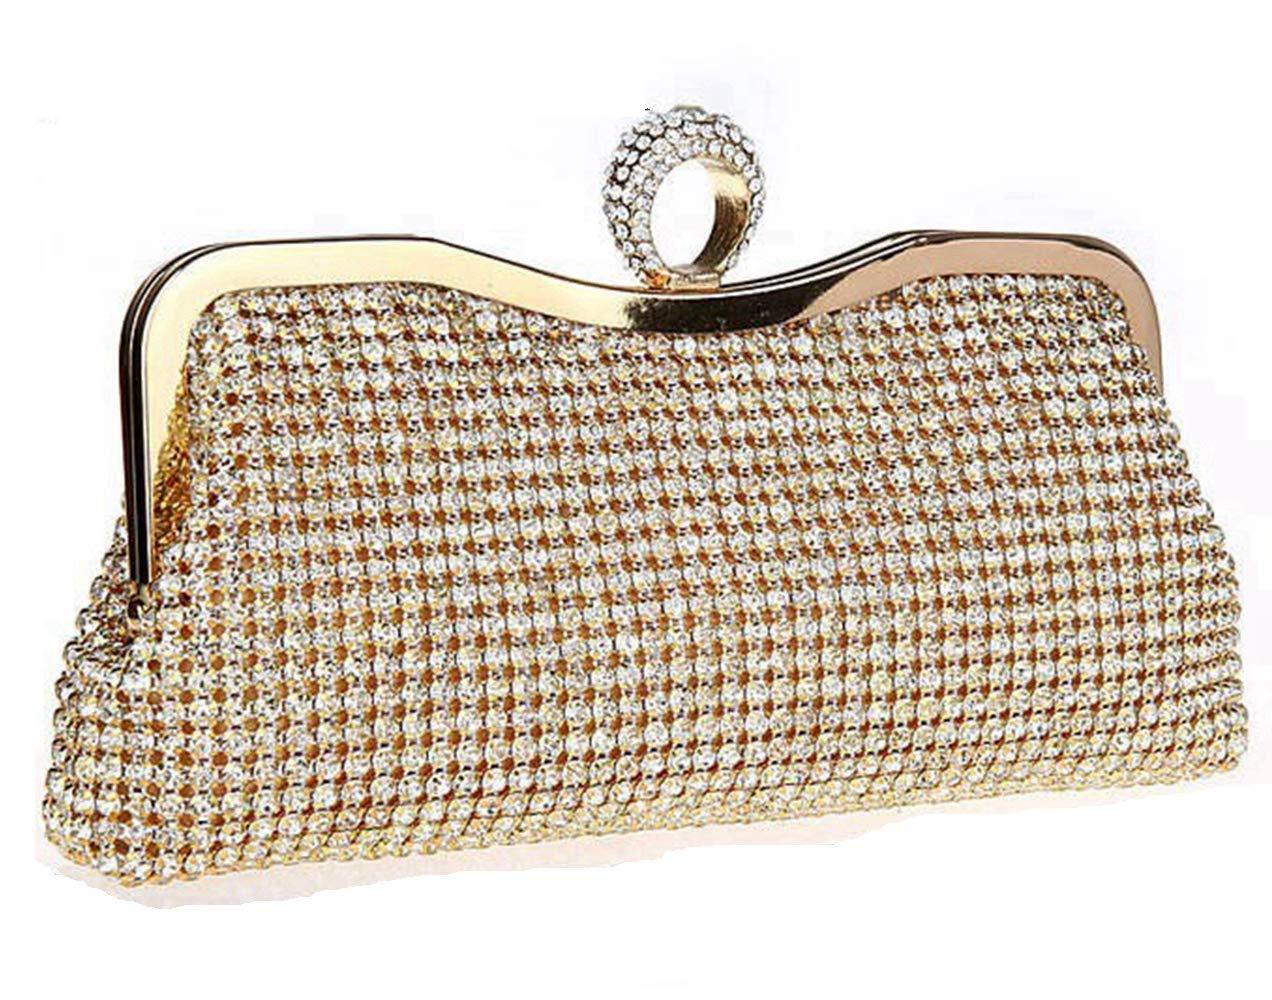 Ring Evening Handbag Rhinestone Clutch Bag for Party Bridal Clutches Dinner Purse-Gold (Gold)